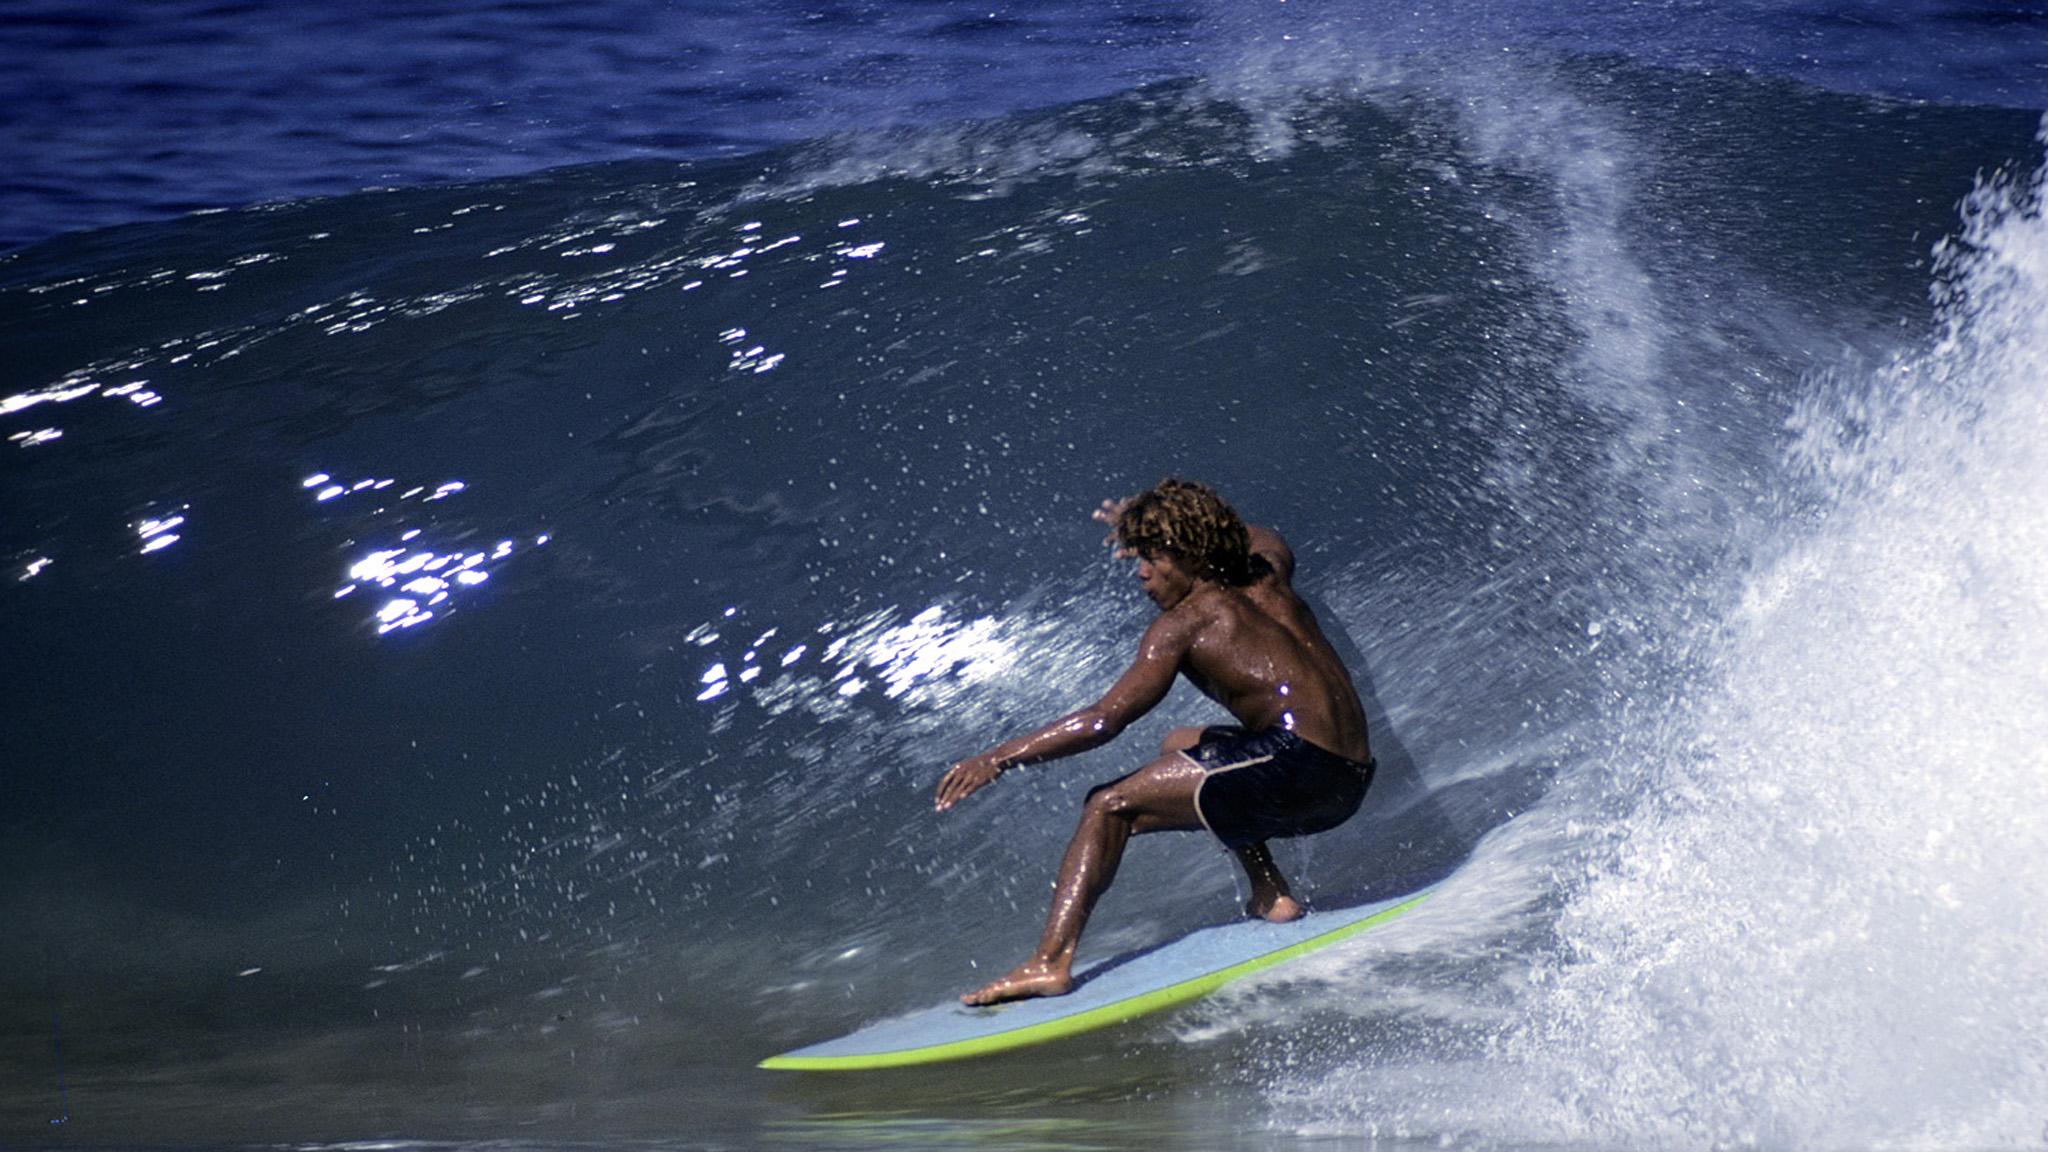 Kaluhiokalani was an icon of surfing's shortboard revolution and the magic of Hawaii.